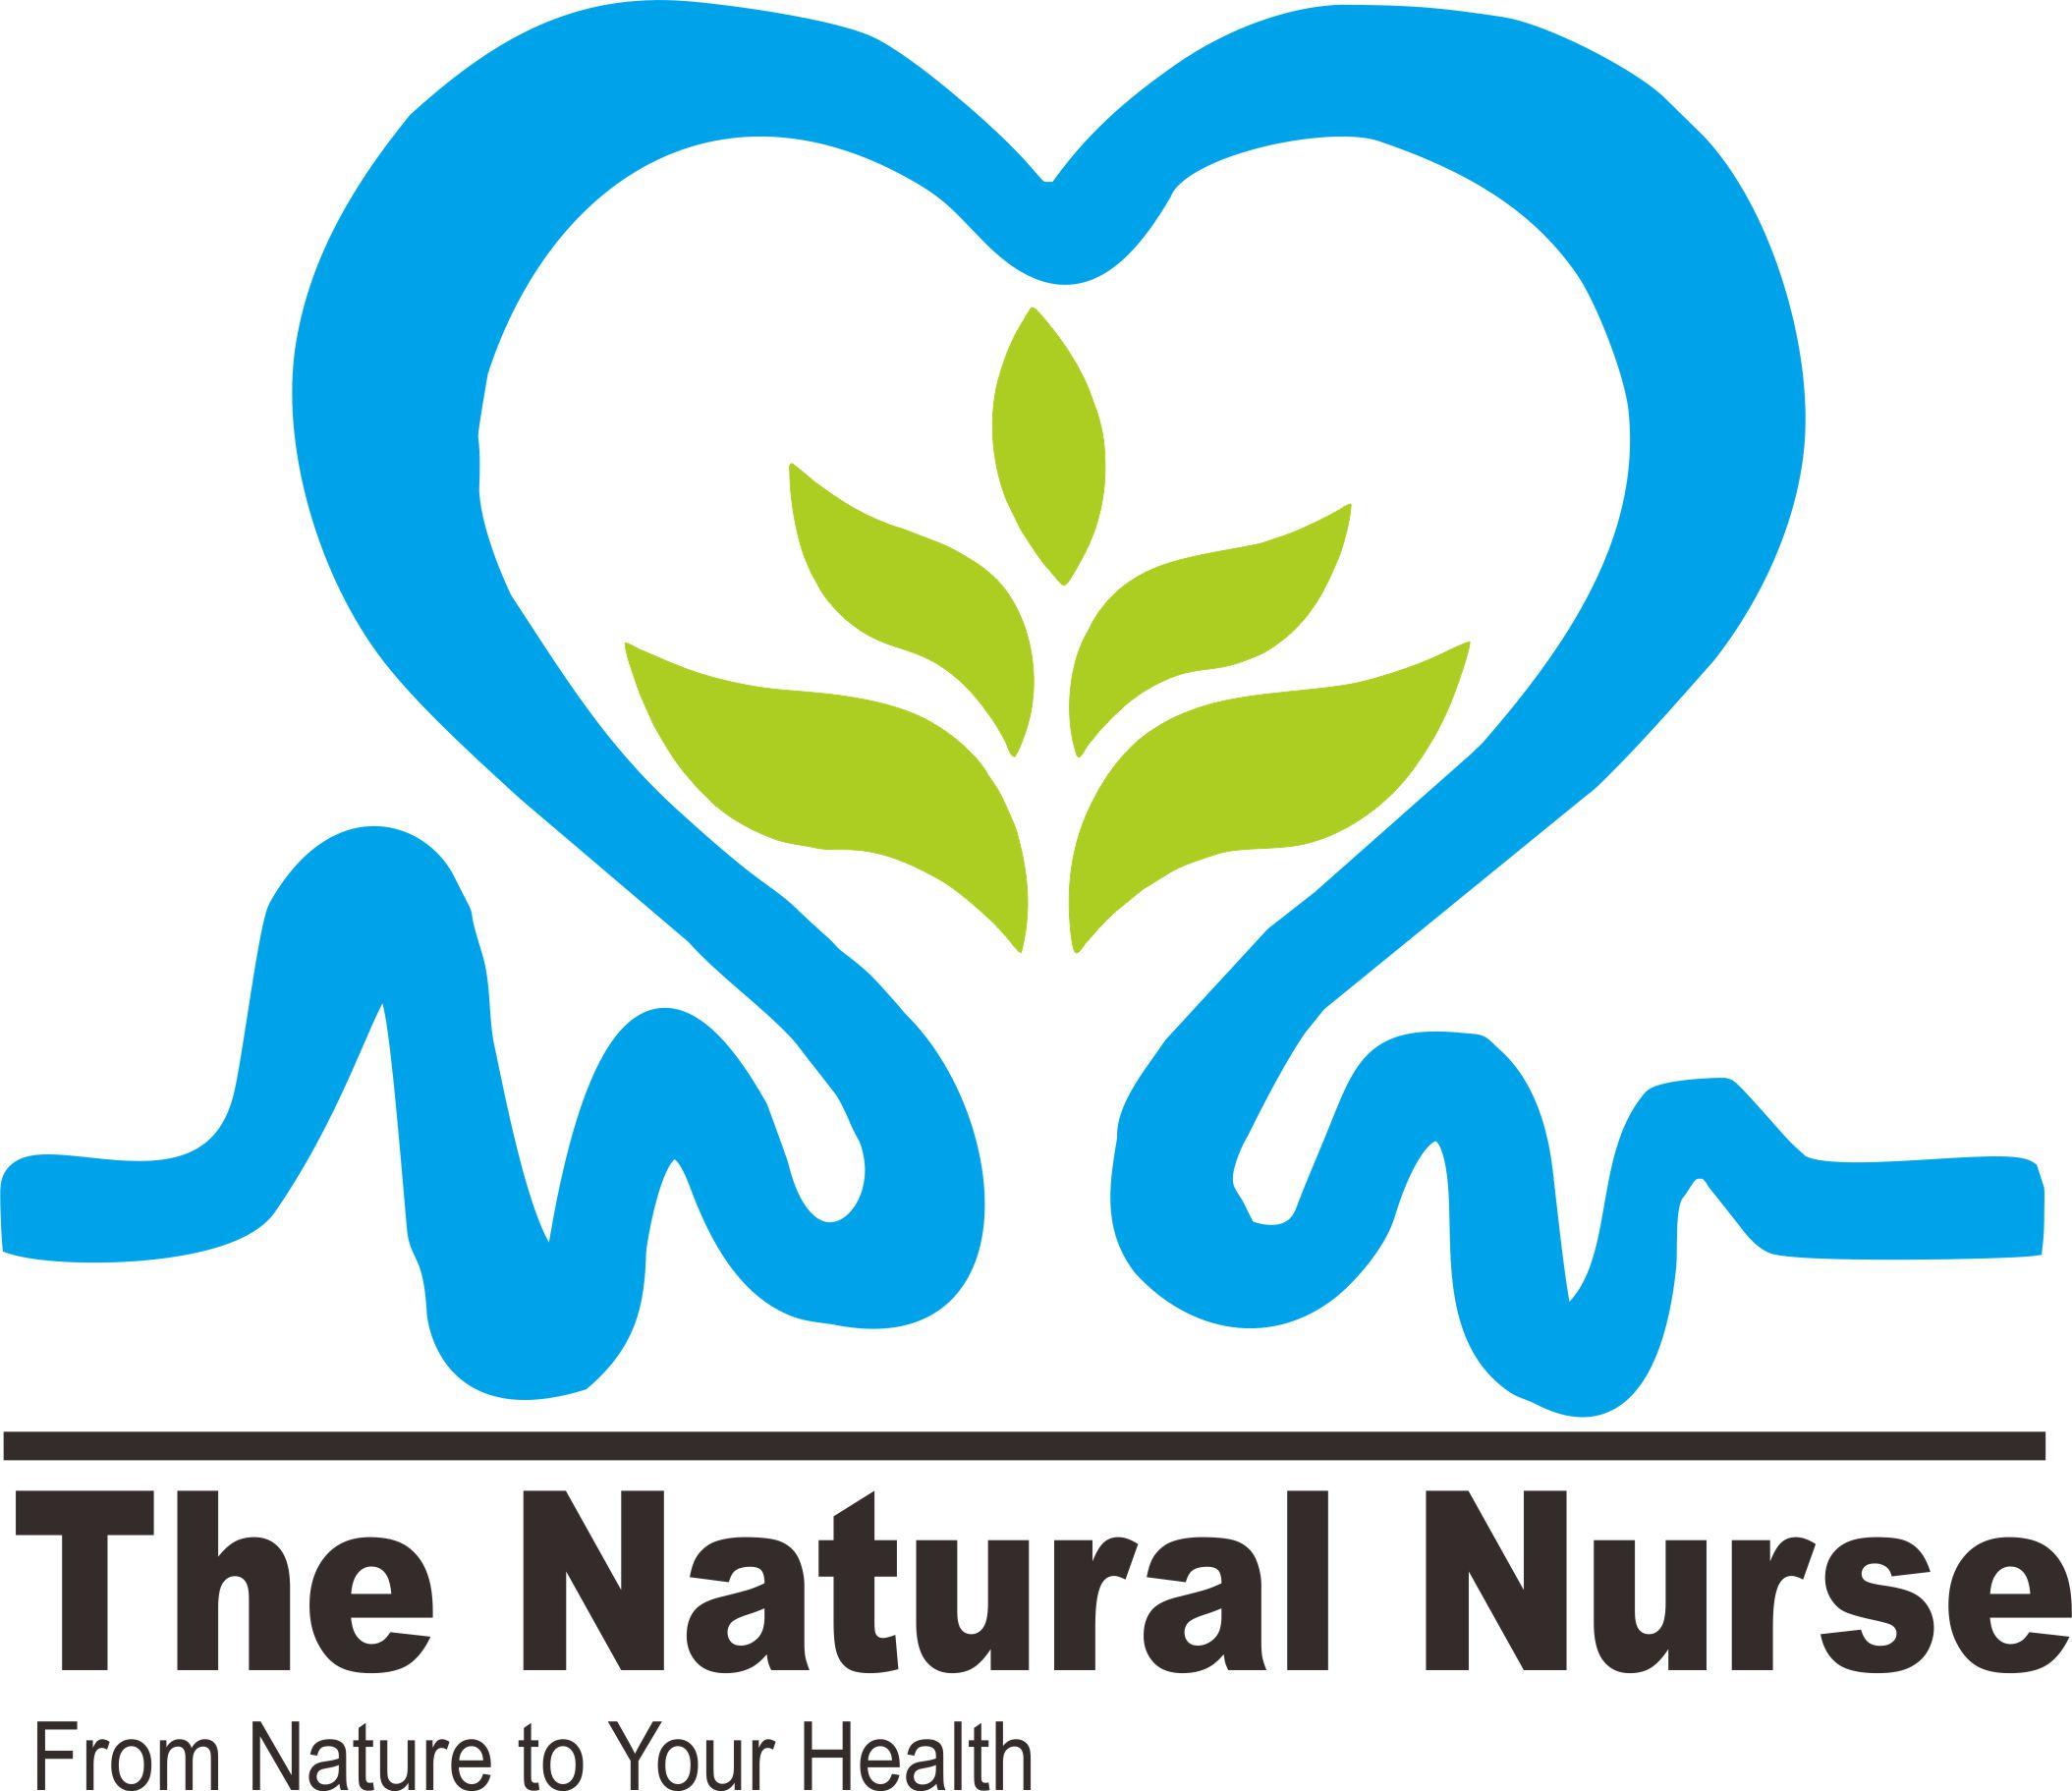 The Natural Nurse LLC